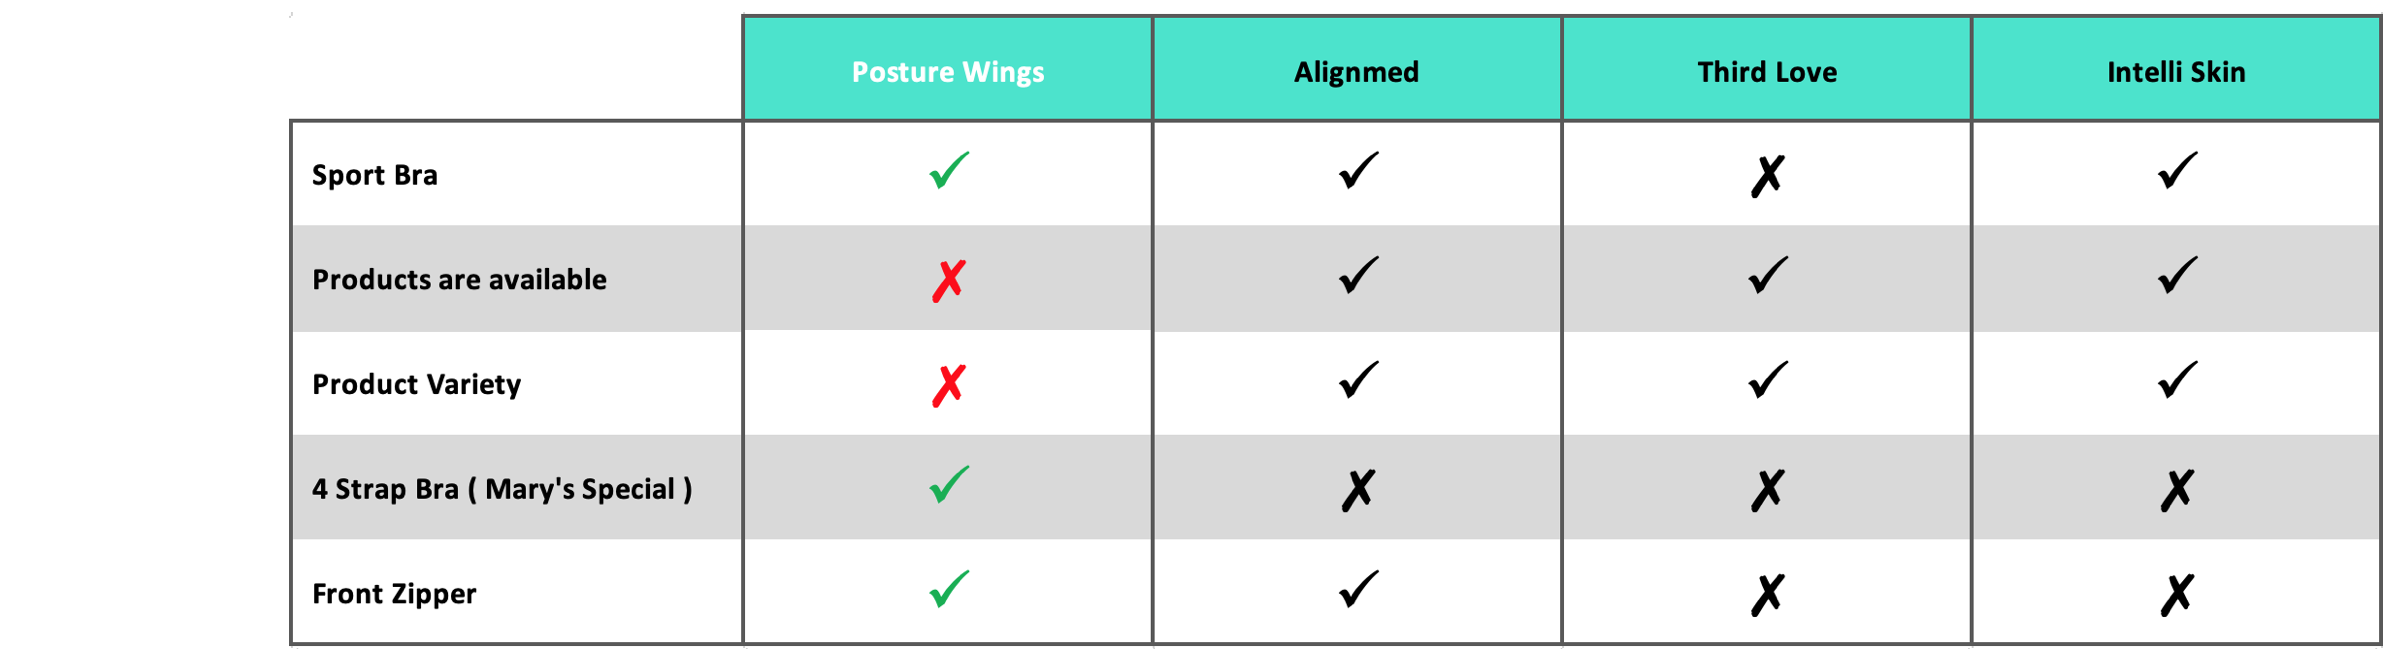 Posture Wings